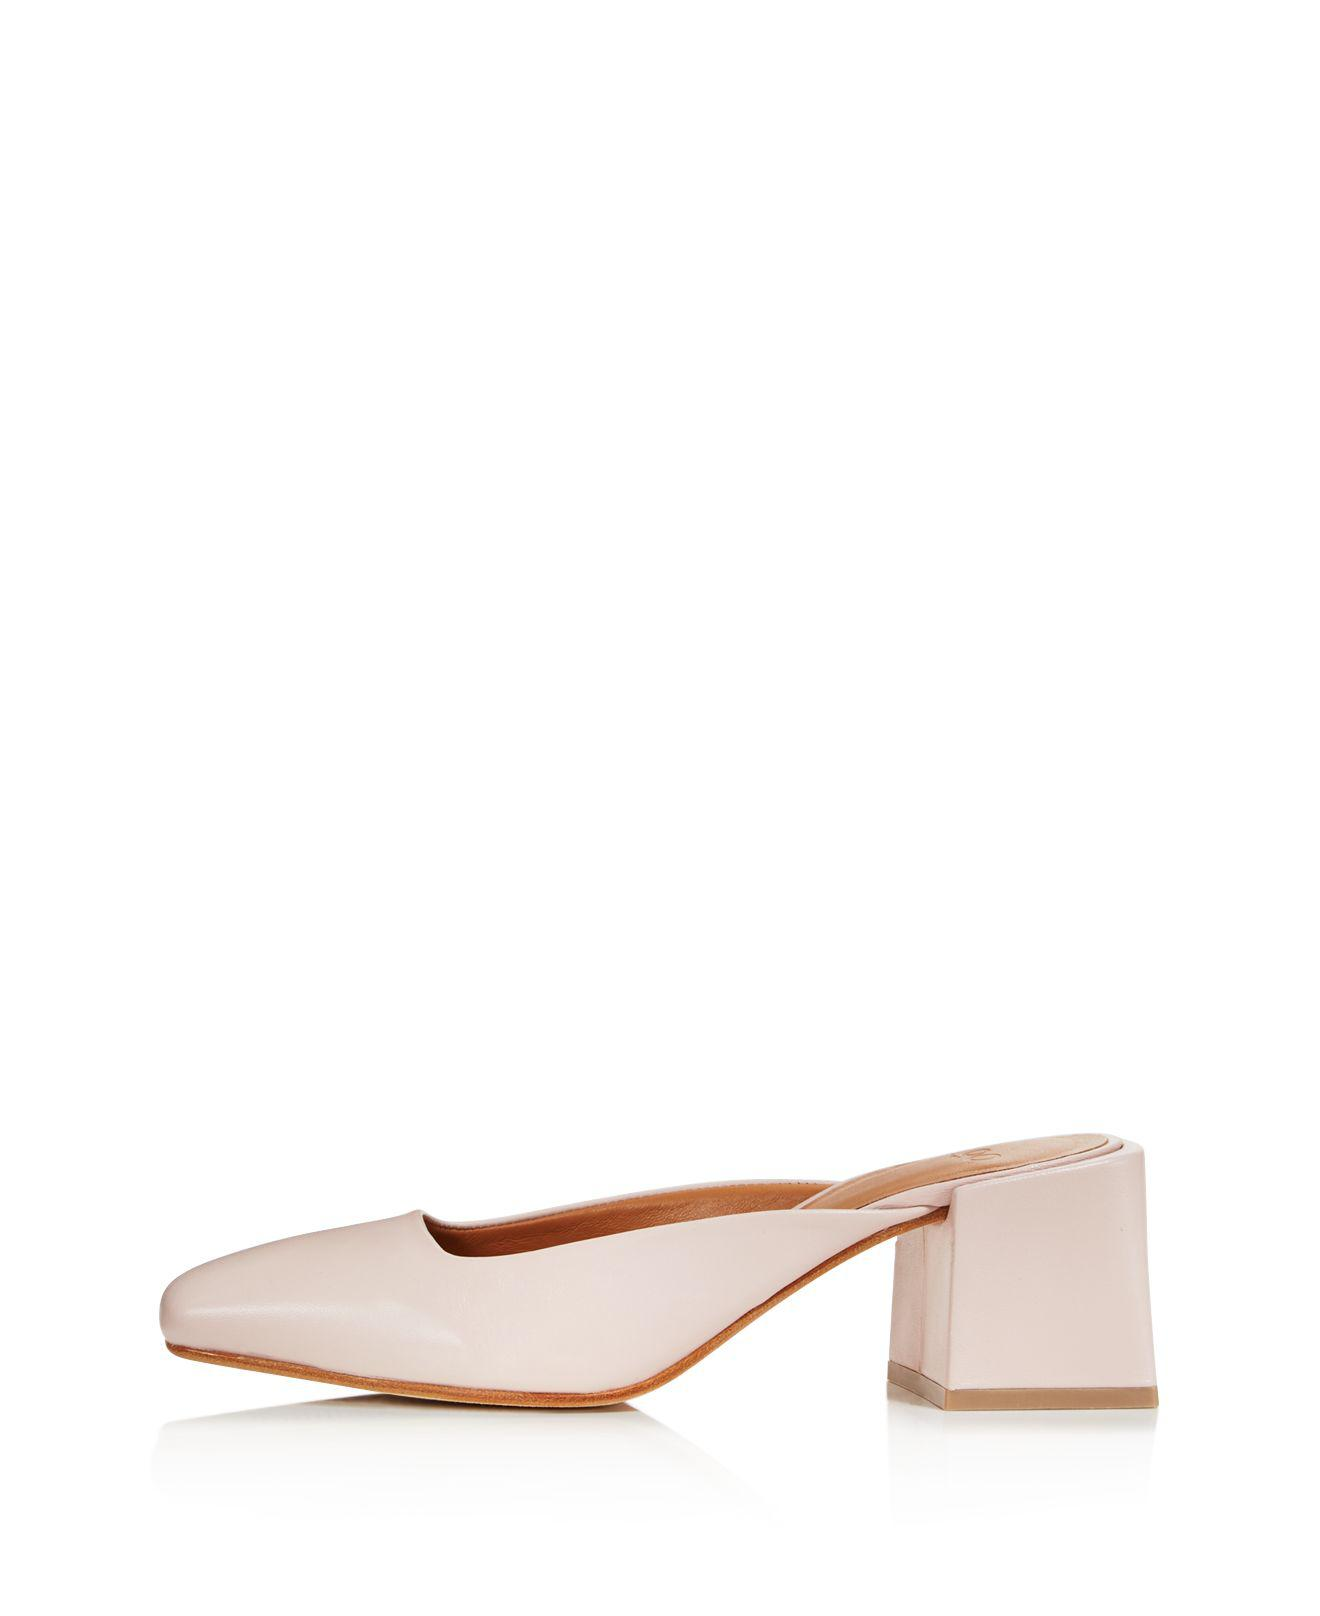 LOQ Women's Leather Square Heel Mules UIrfcK